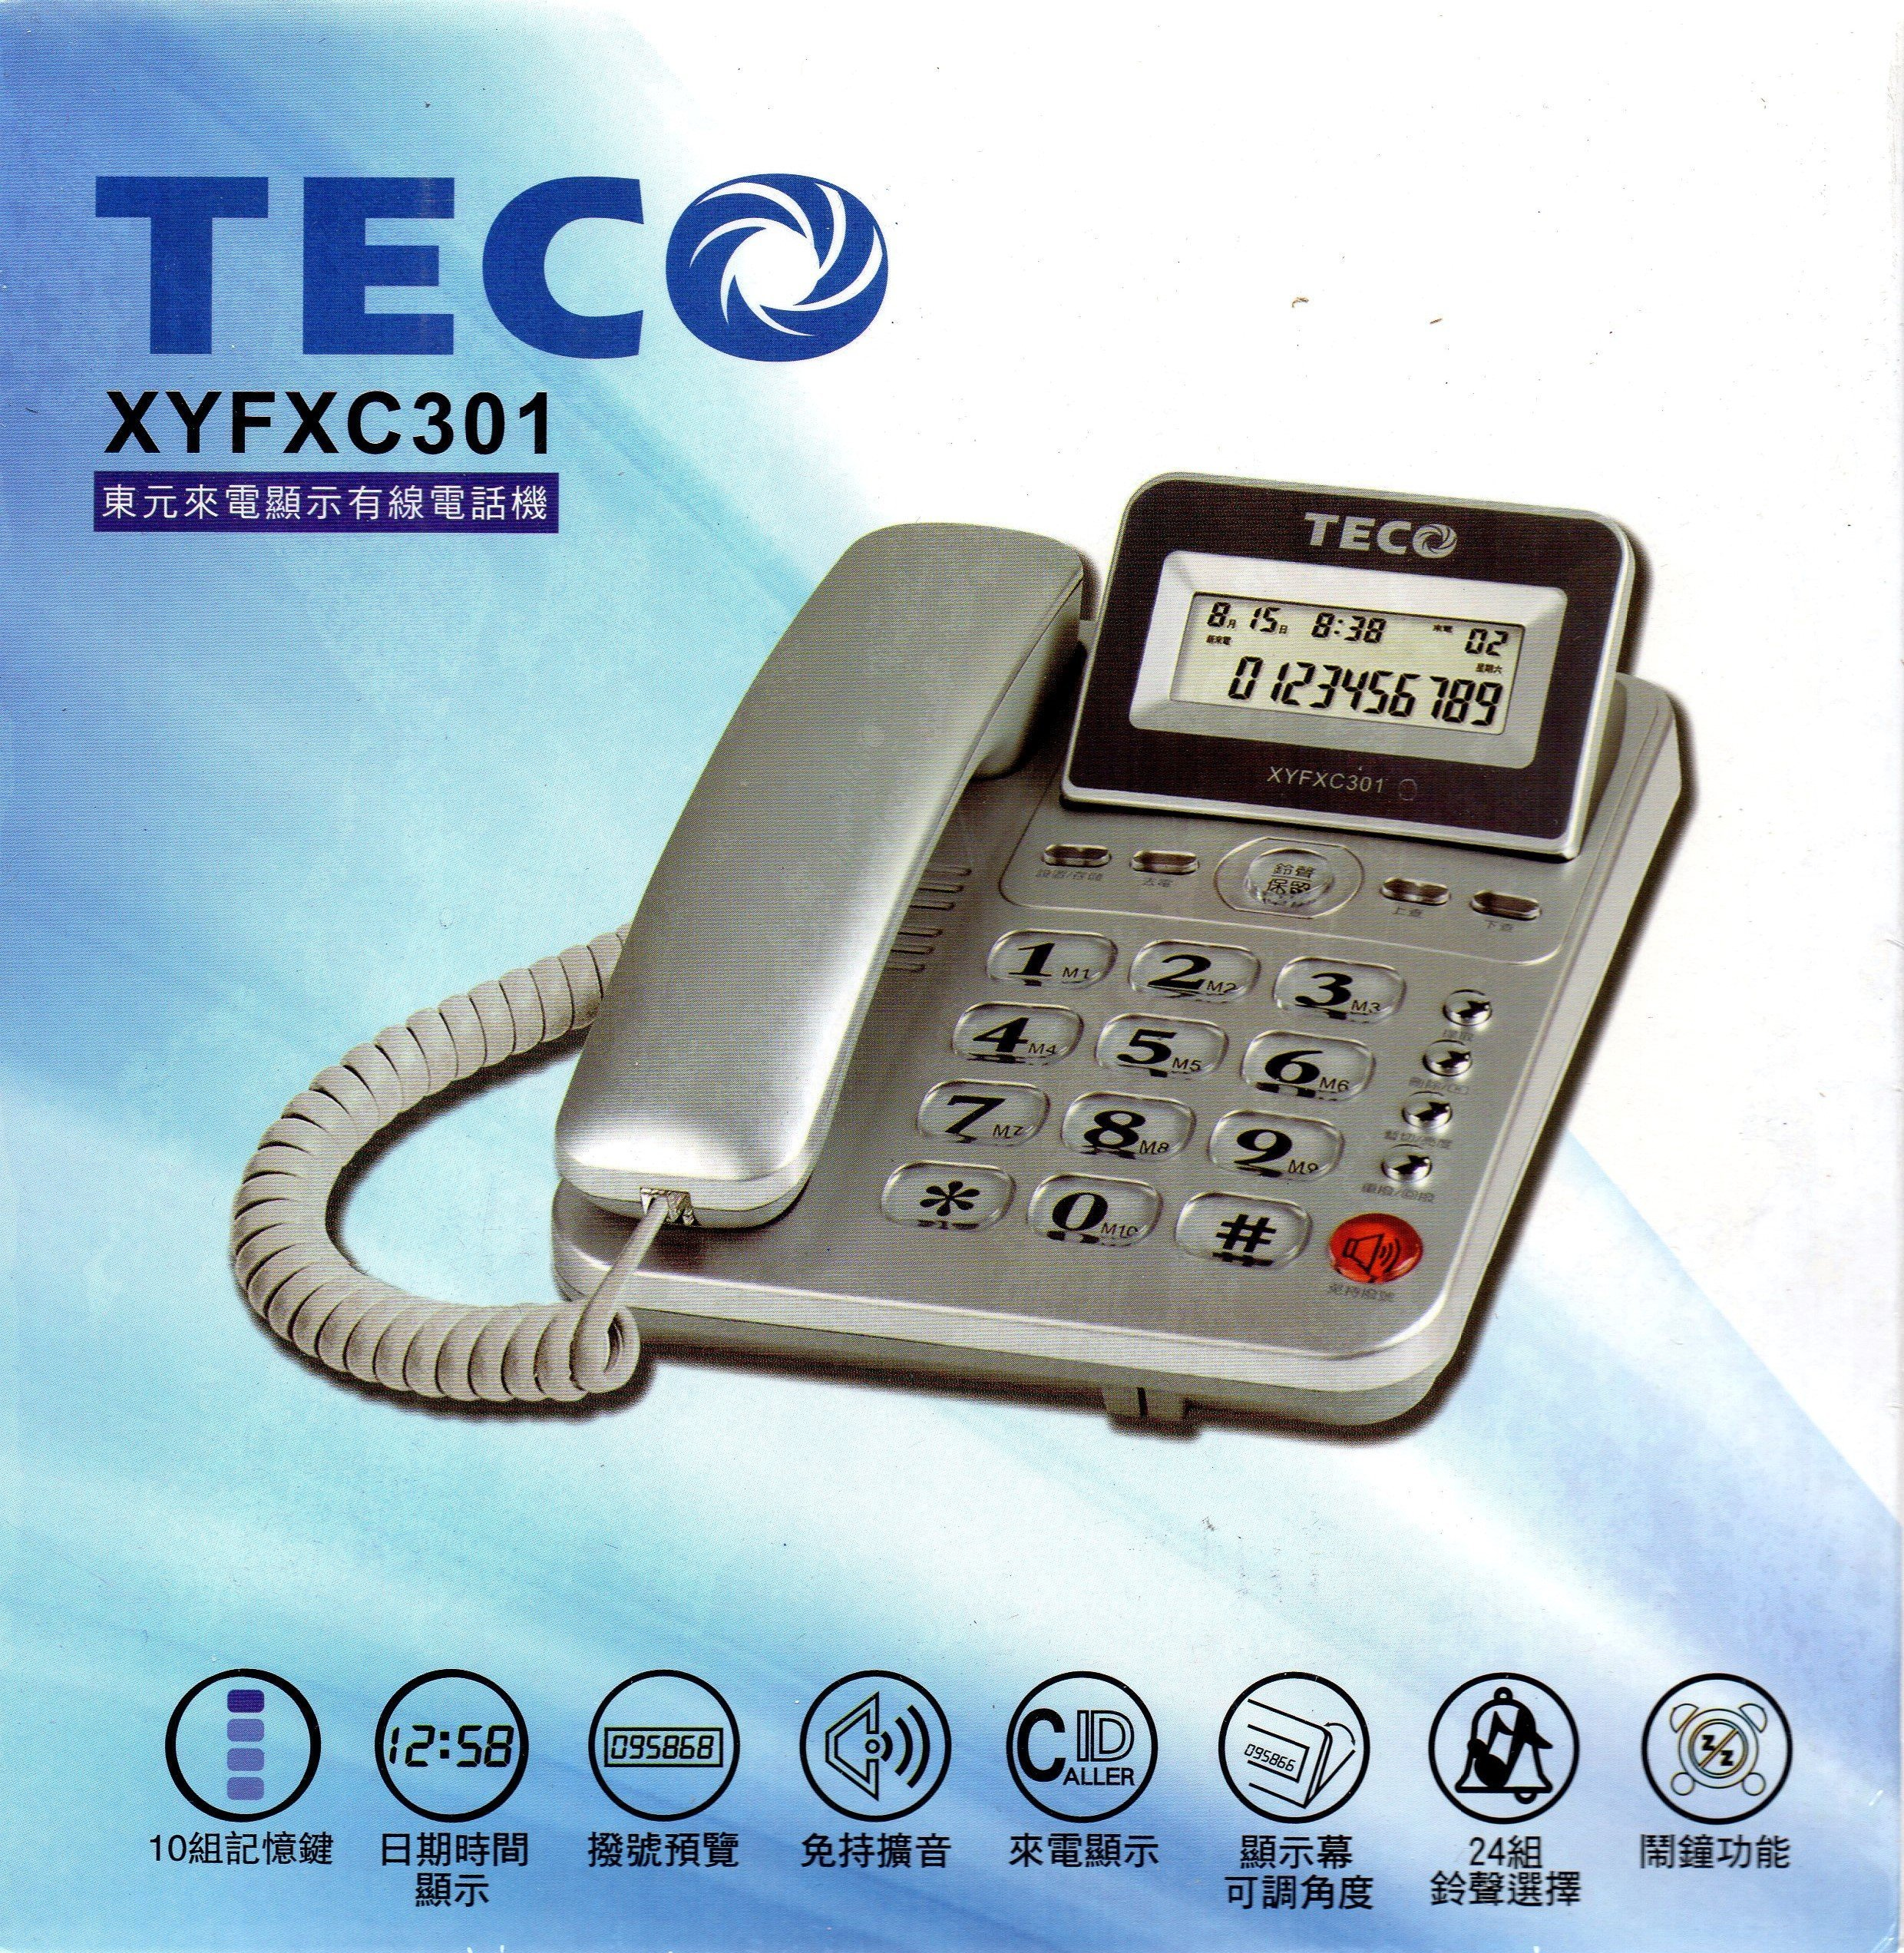 【NICE- 】免運_ TECO 東元 XYFXC301 來電顯示有線電話_銀色款 紅色款_可調整螢幕角度